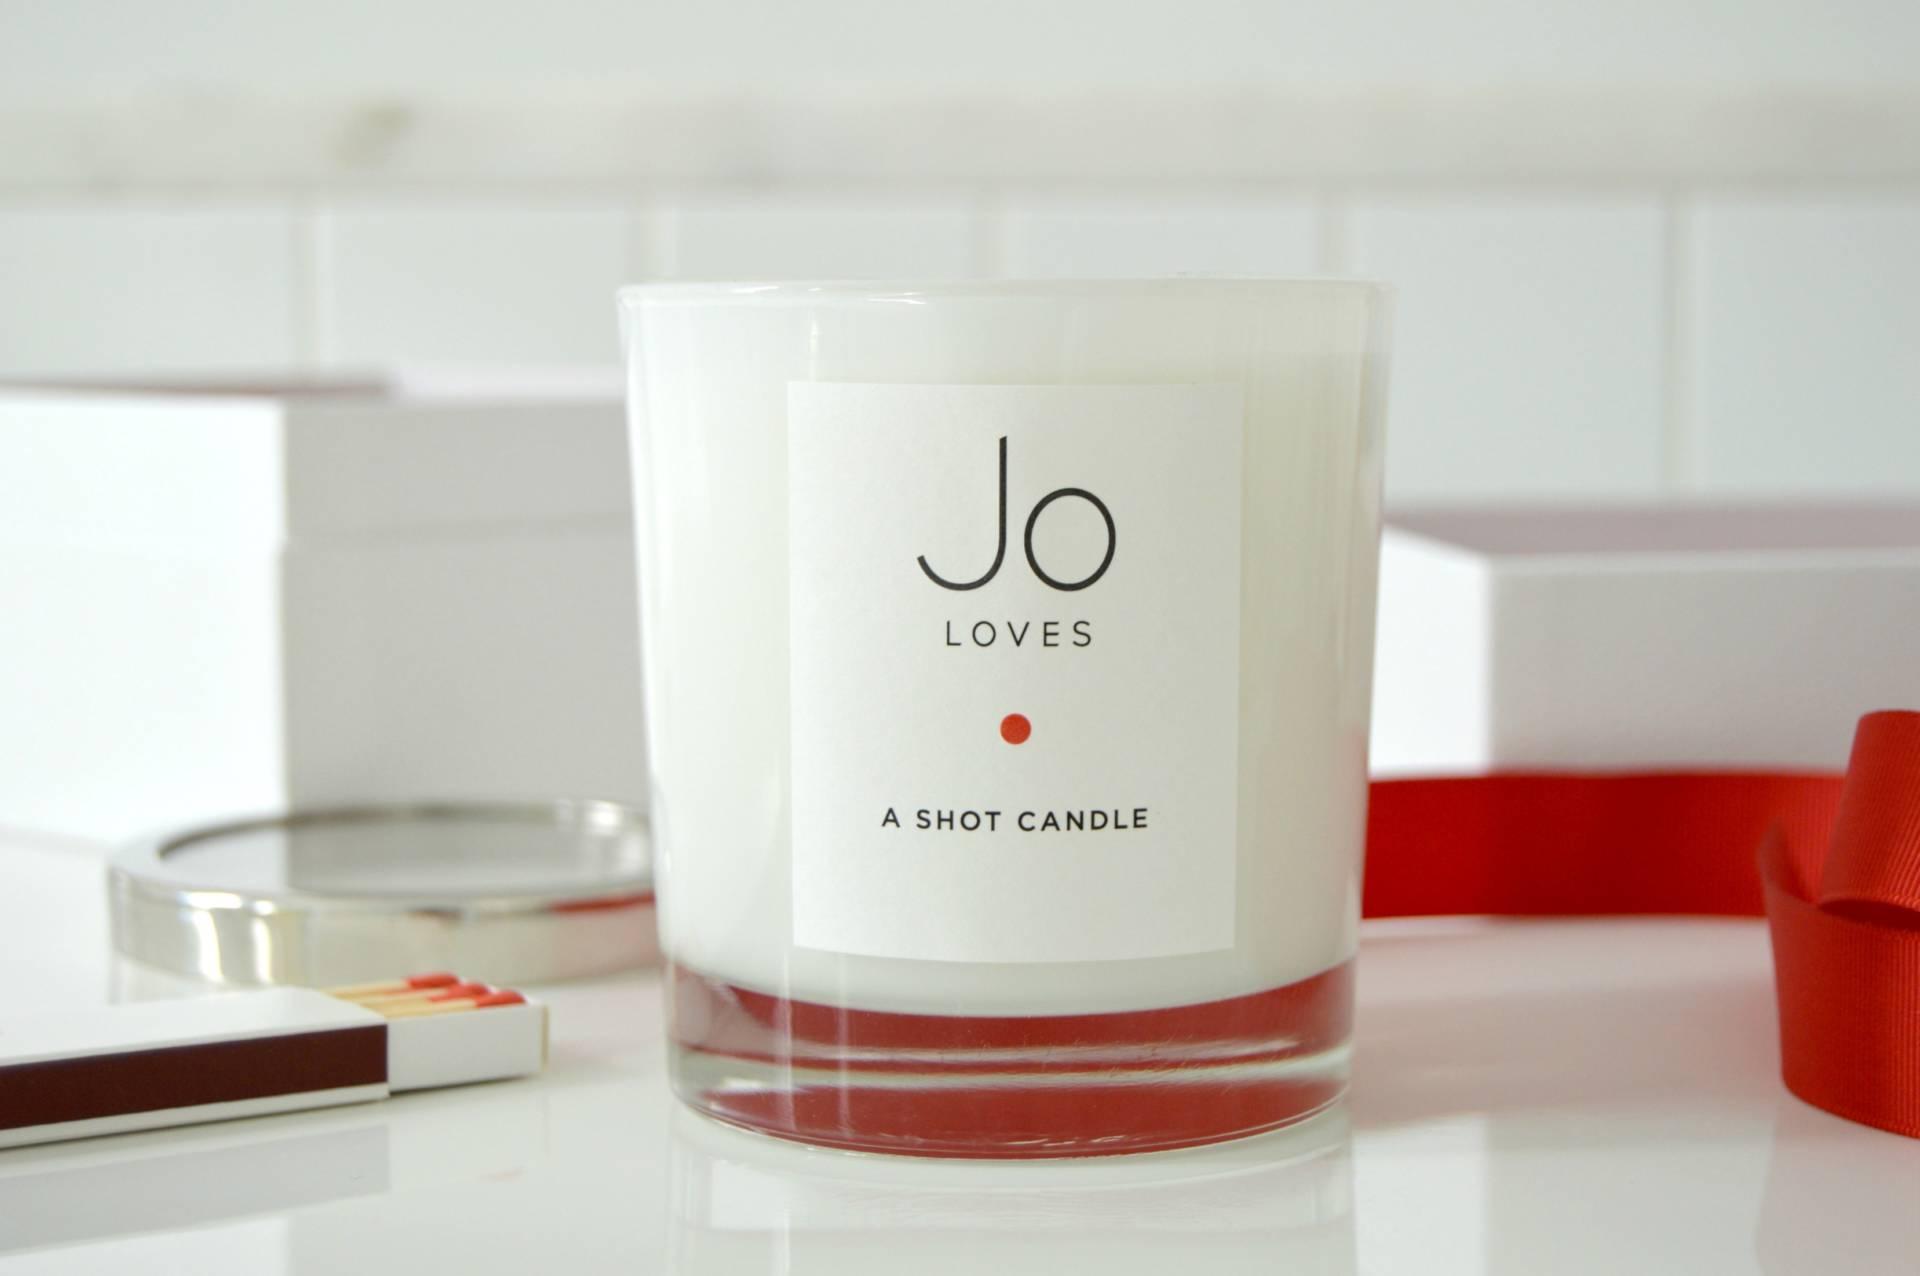 jo loves a shot candle inhautepursuit review